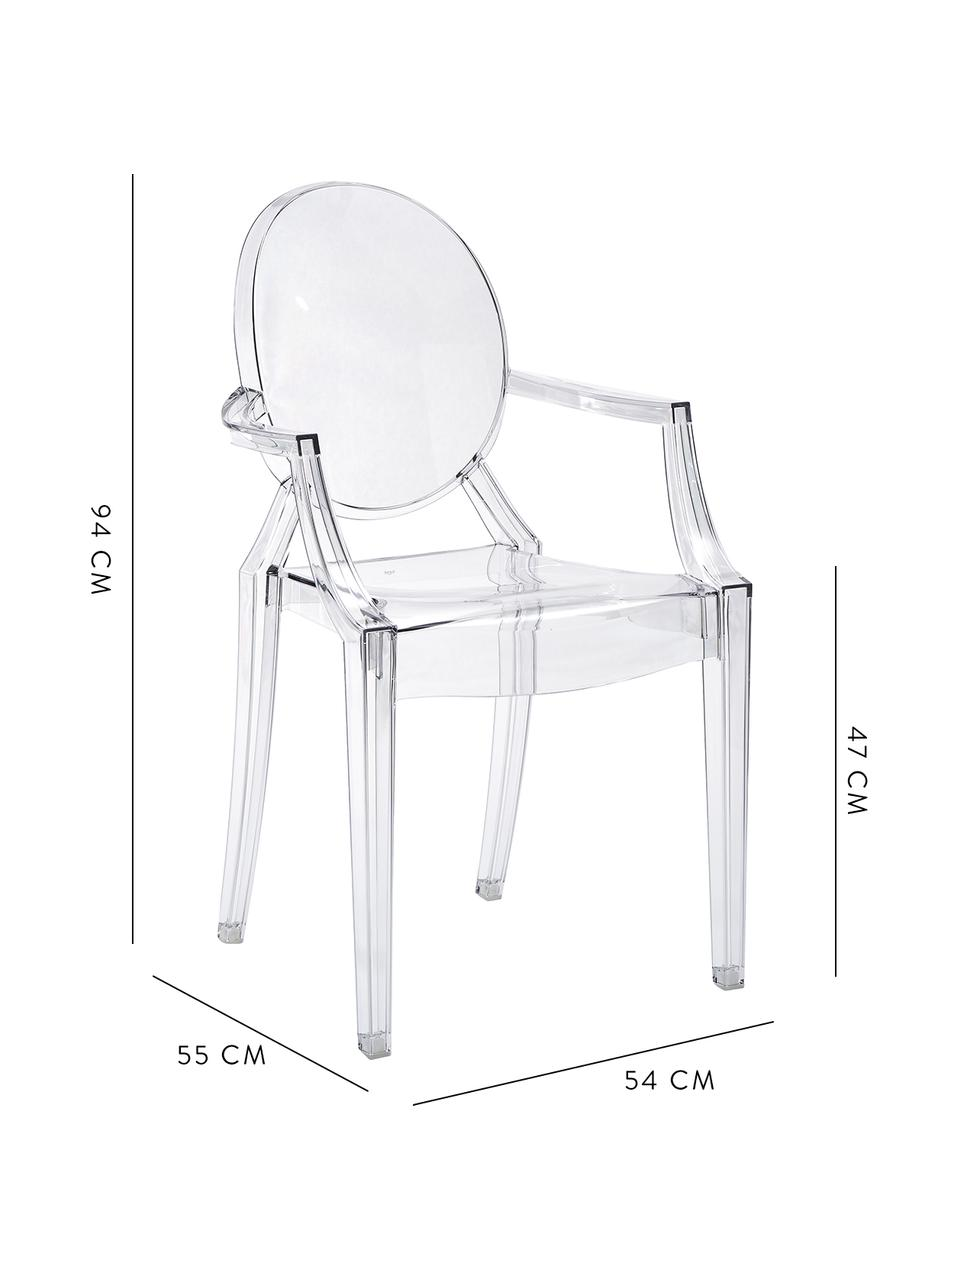 Sedia trasparente con braccioli  Louis Ghost, Policarbonato, Trasparente, Larg. 54 x Prof. 55 cm